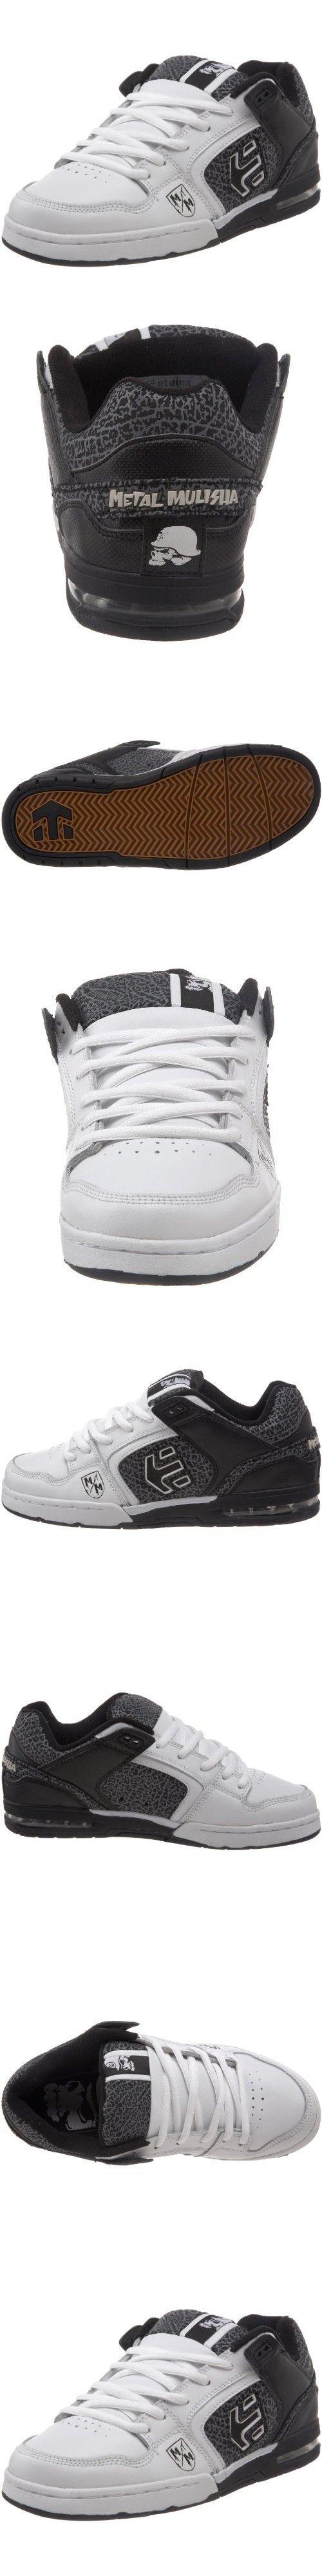 Etnies Men's Chrome 02 Skate Shoe,Black/White/Black,10.5 M US